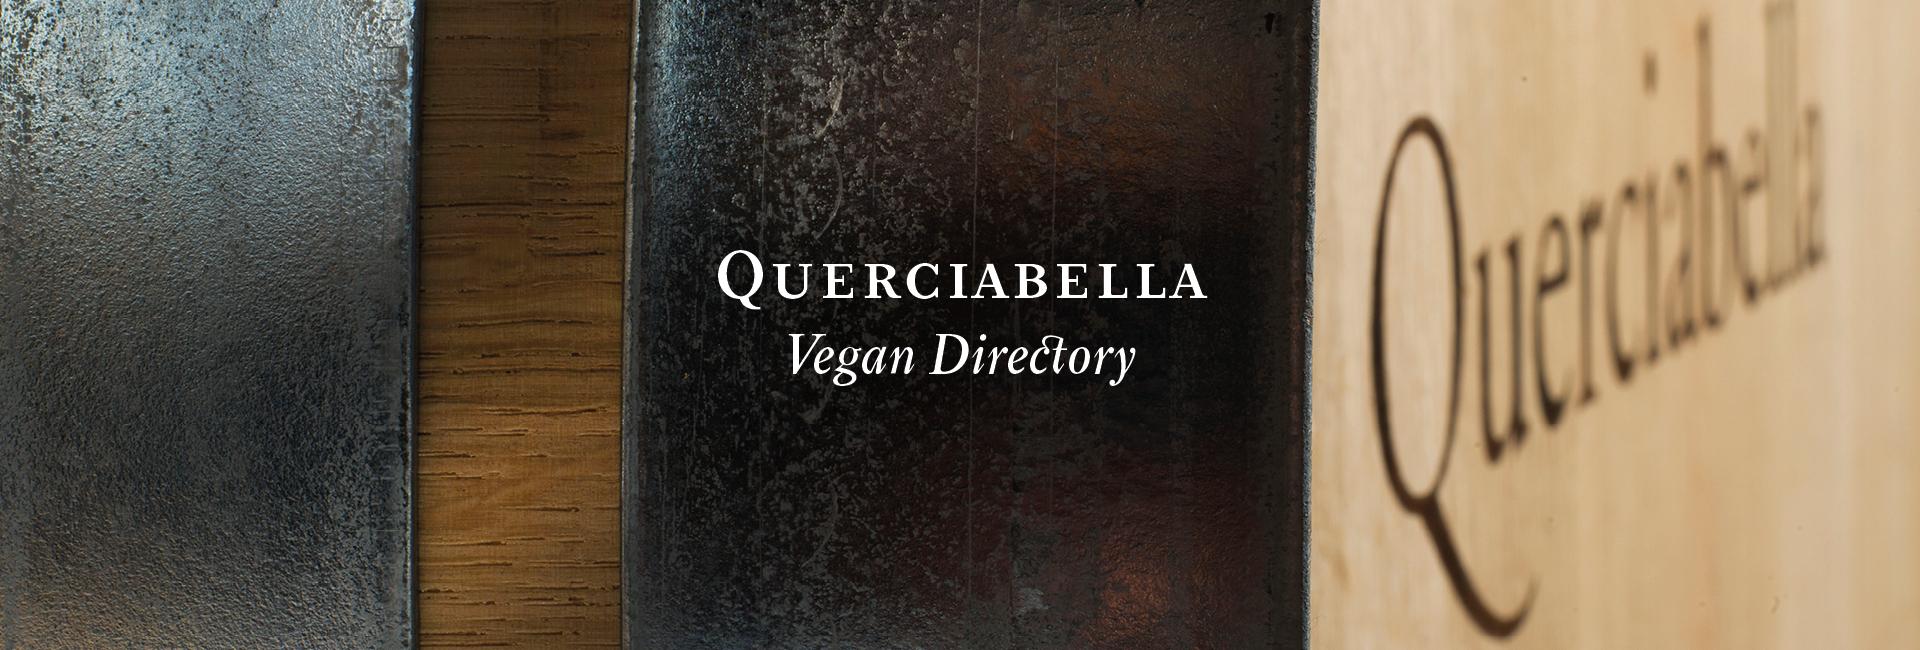 Querciabella vegan directory